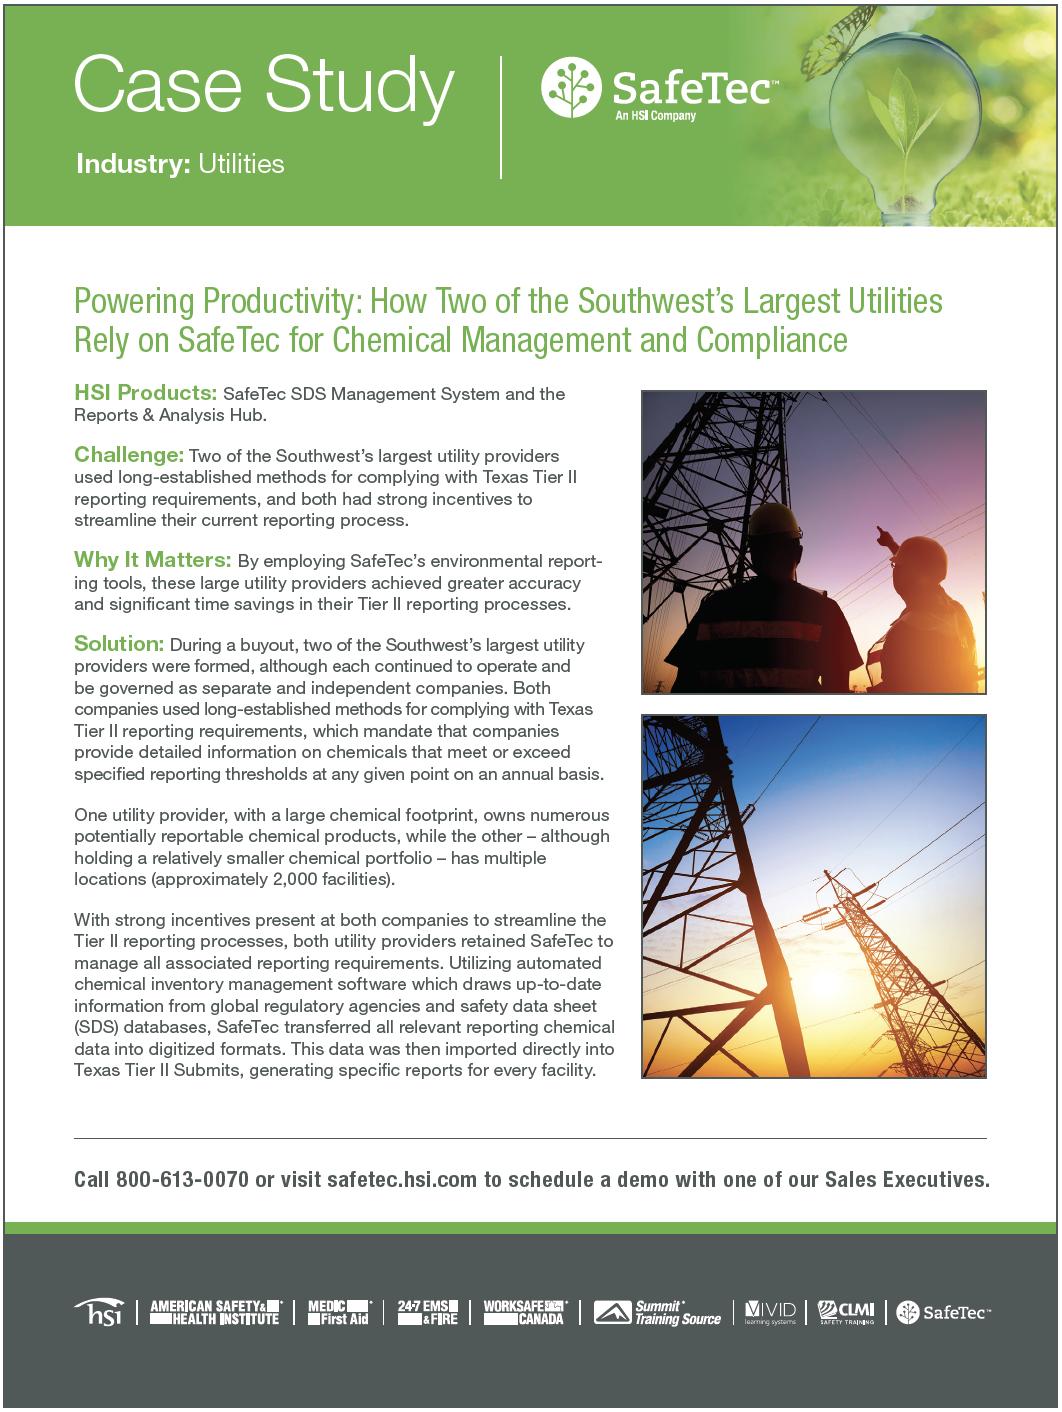 SafeTec Case Study - Southwest Utilities Provider.jpg